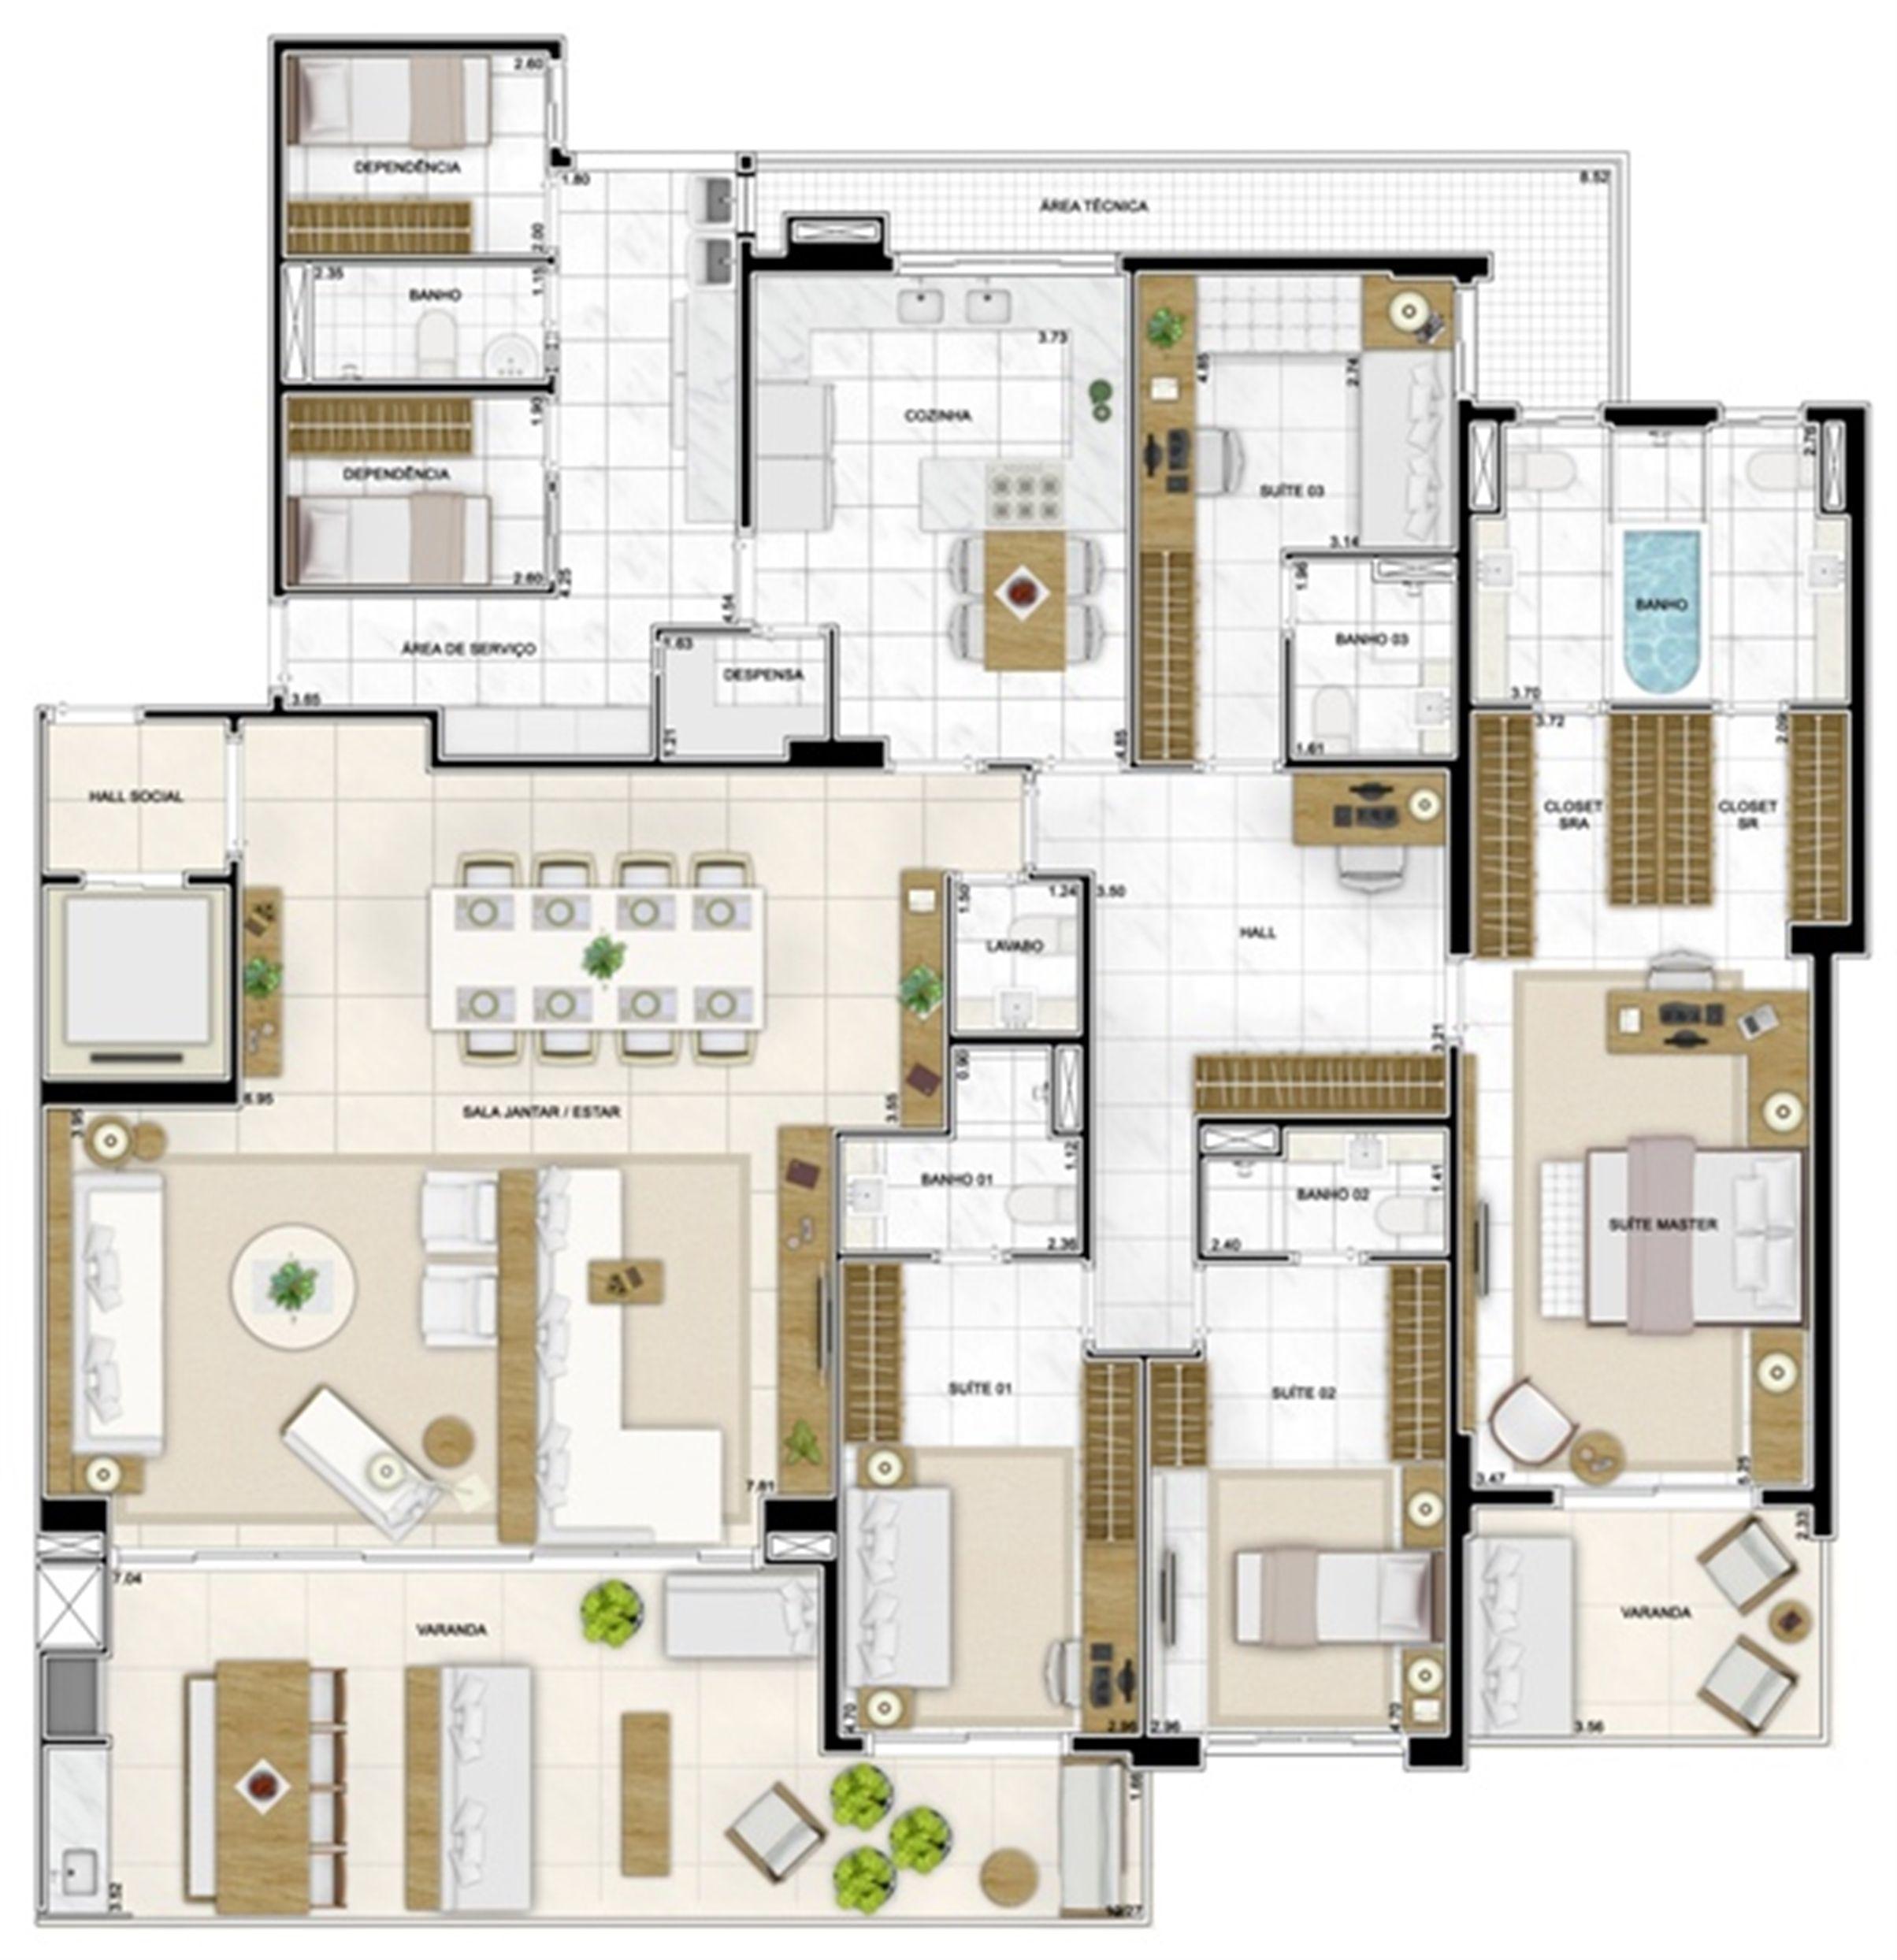 Planta Tipo 282 m² | Infinity Areia Preta – Apartamento na  Areia Preta - Natal - Rio Grande do Norte